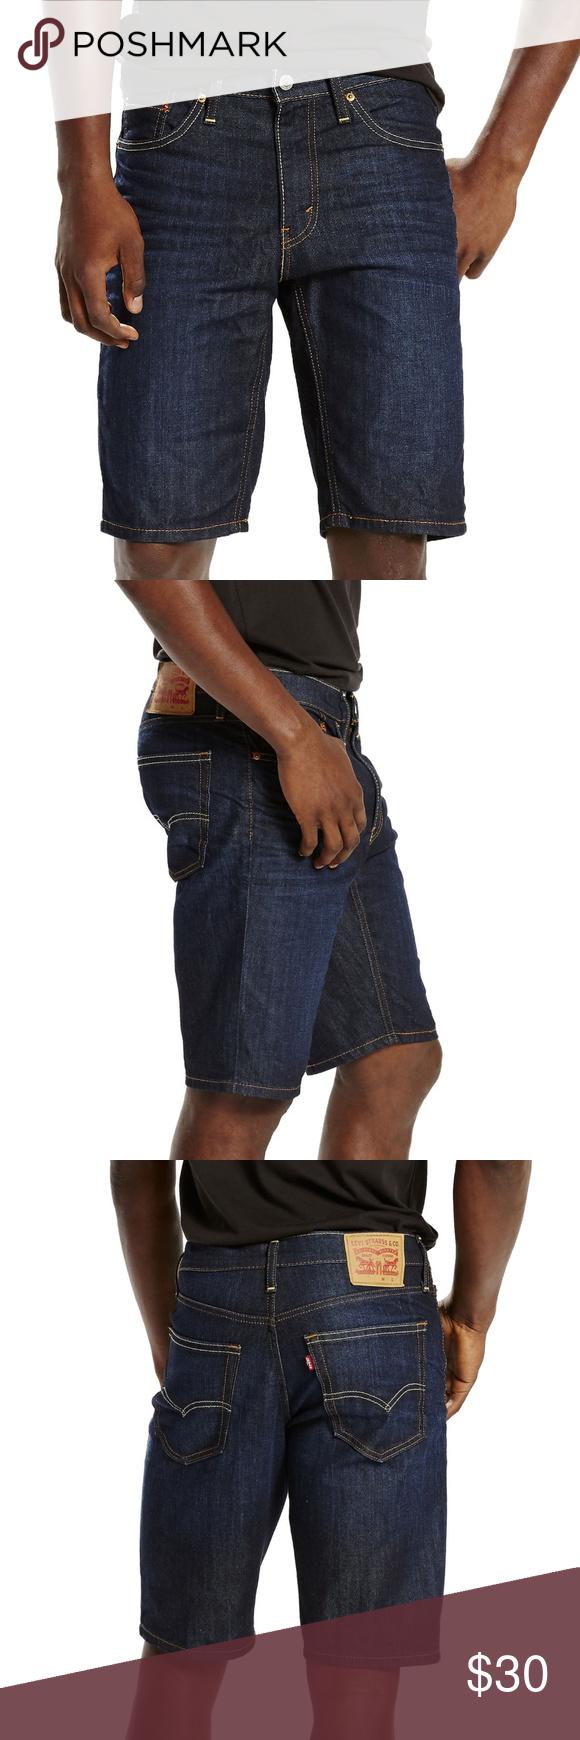 7e7543b7 Levi's 541 Athletic Fit Denim Blue Jean Shorts 40